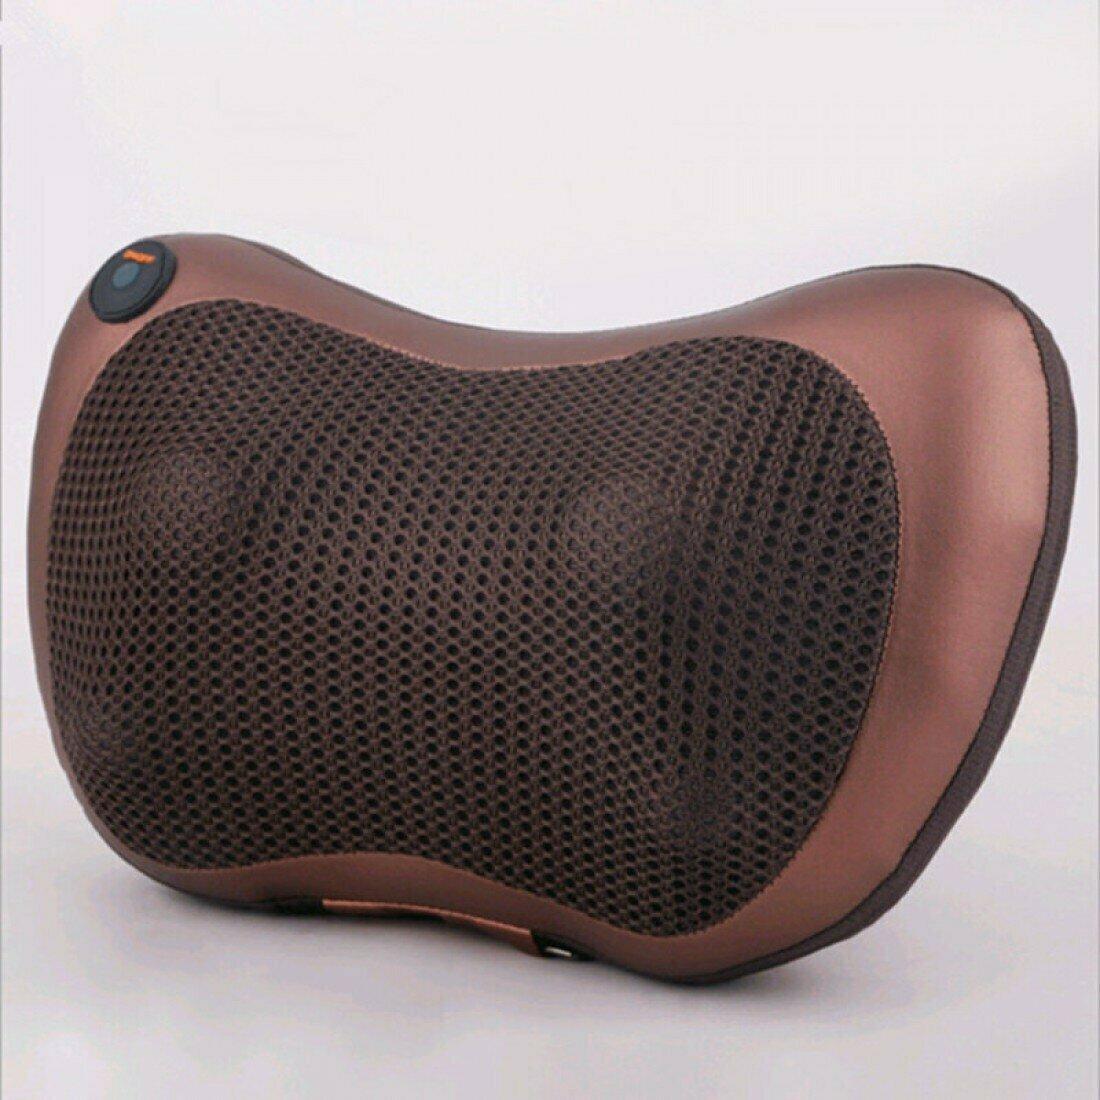 Wellneo Shiatsu - массажная подушка 2 в 1 в Саратове